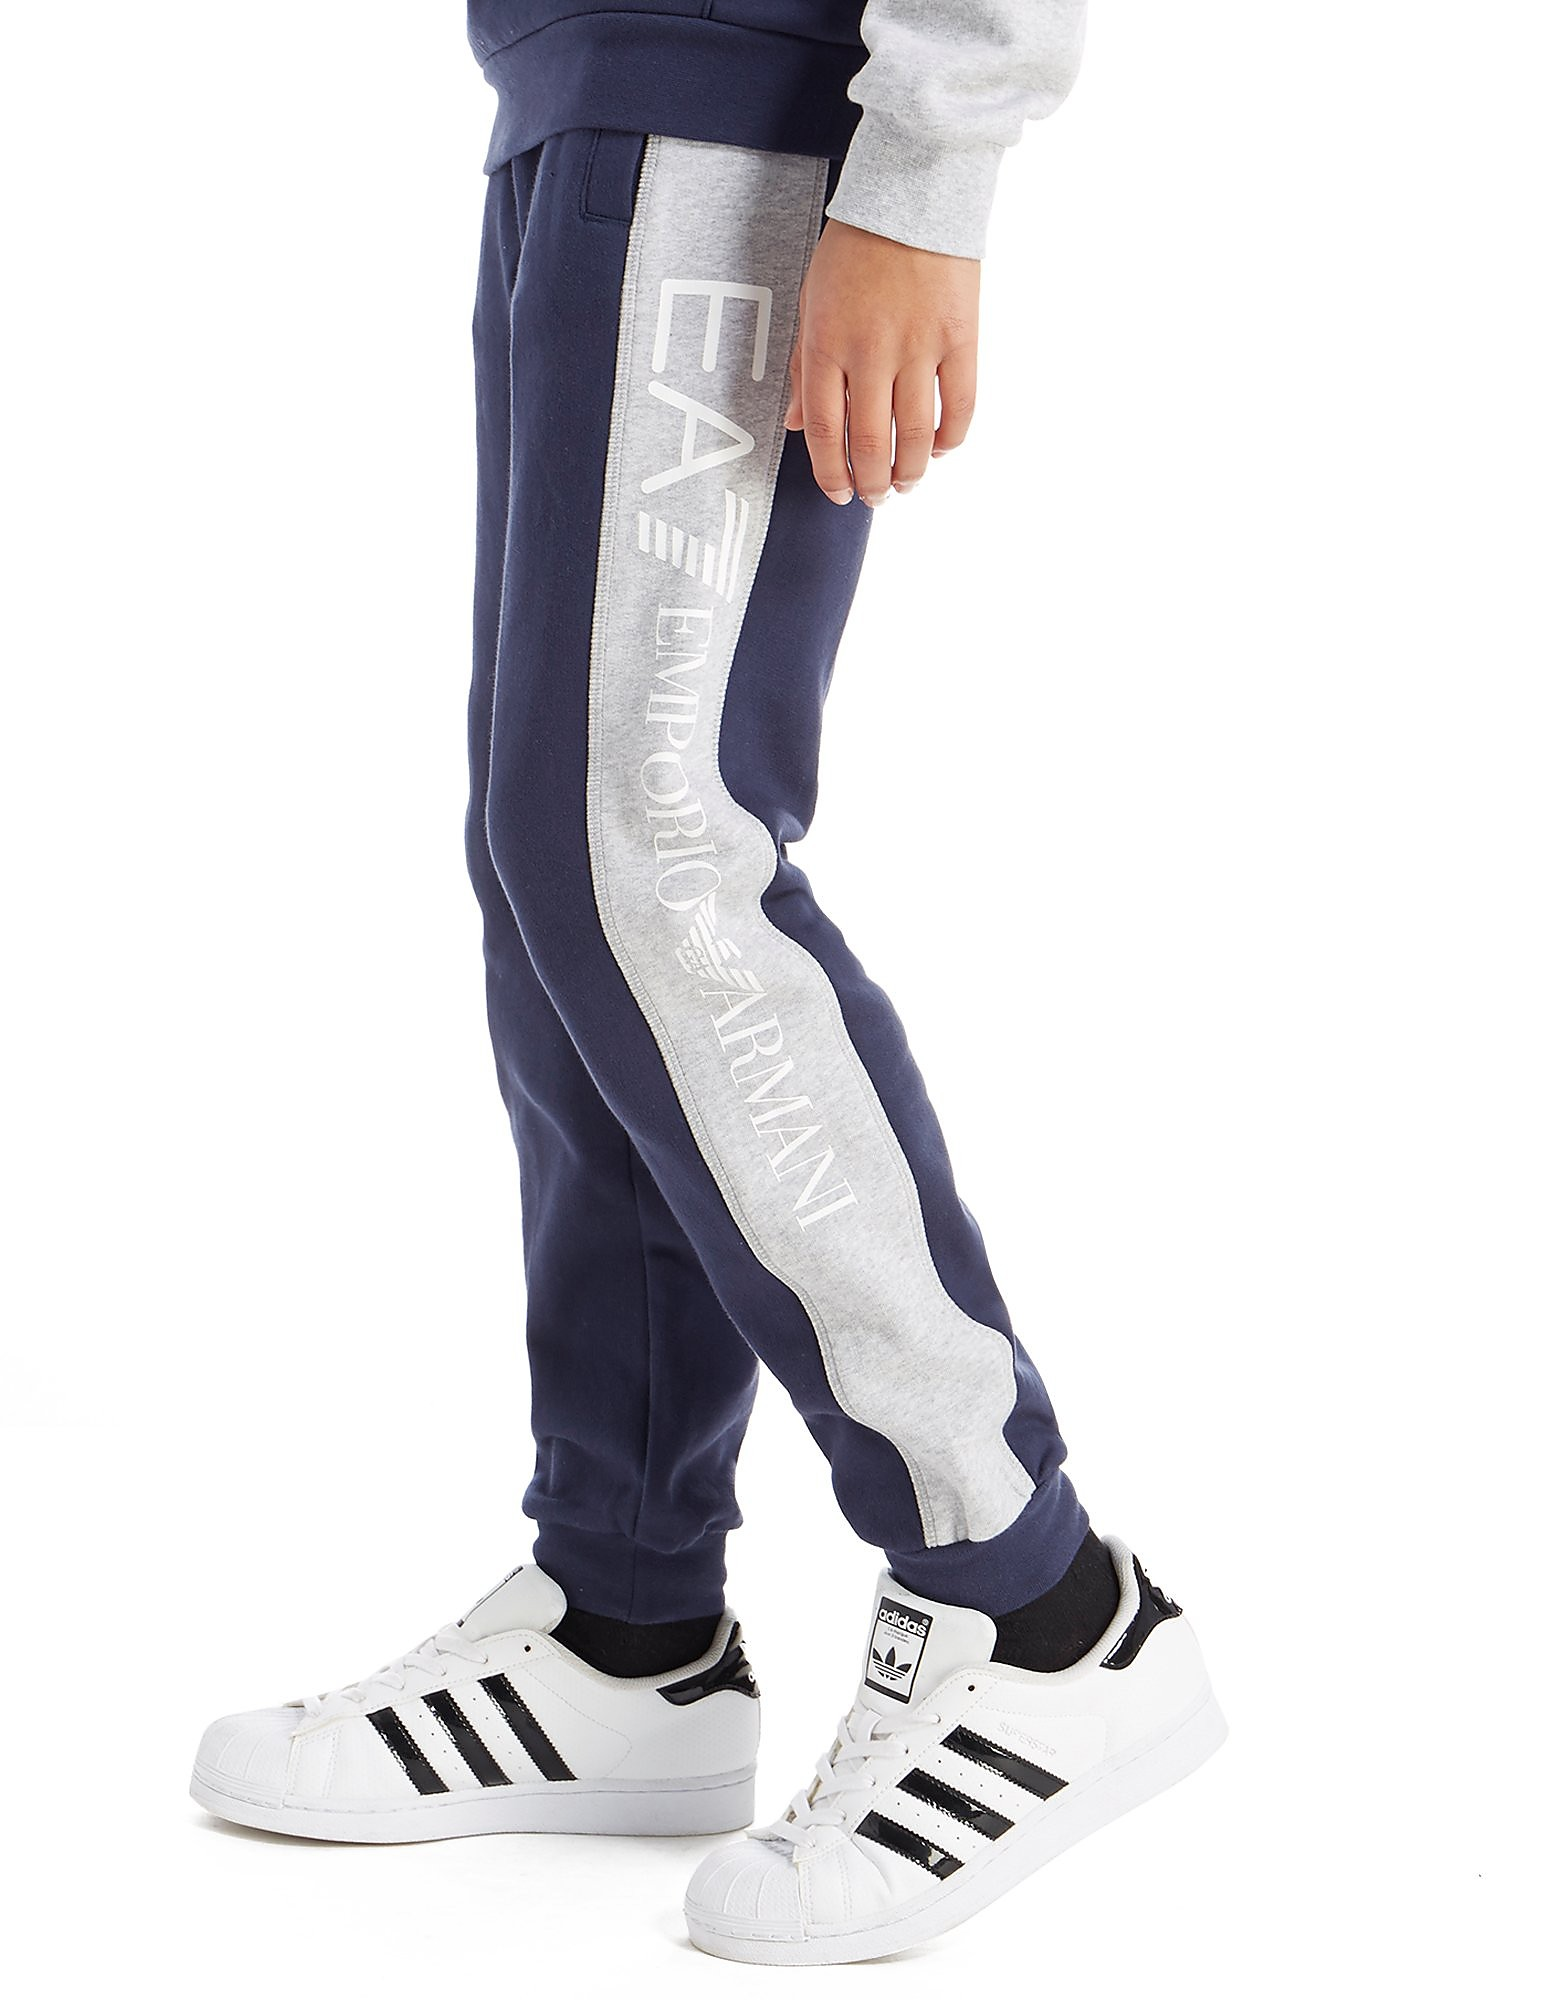 Emporio Armani EA7 Panel Fleece Pants Junior